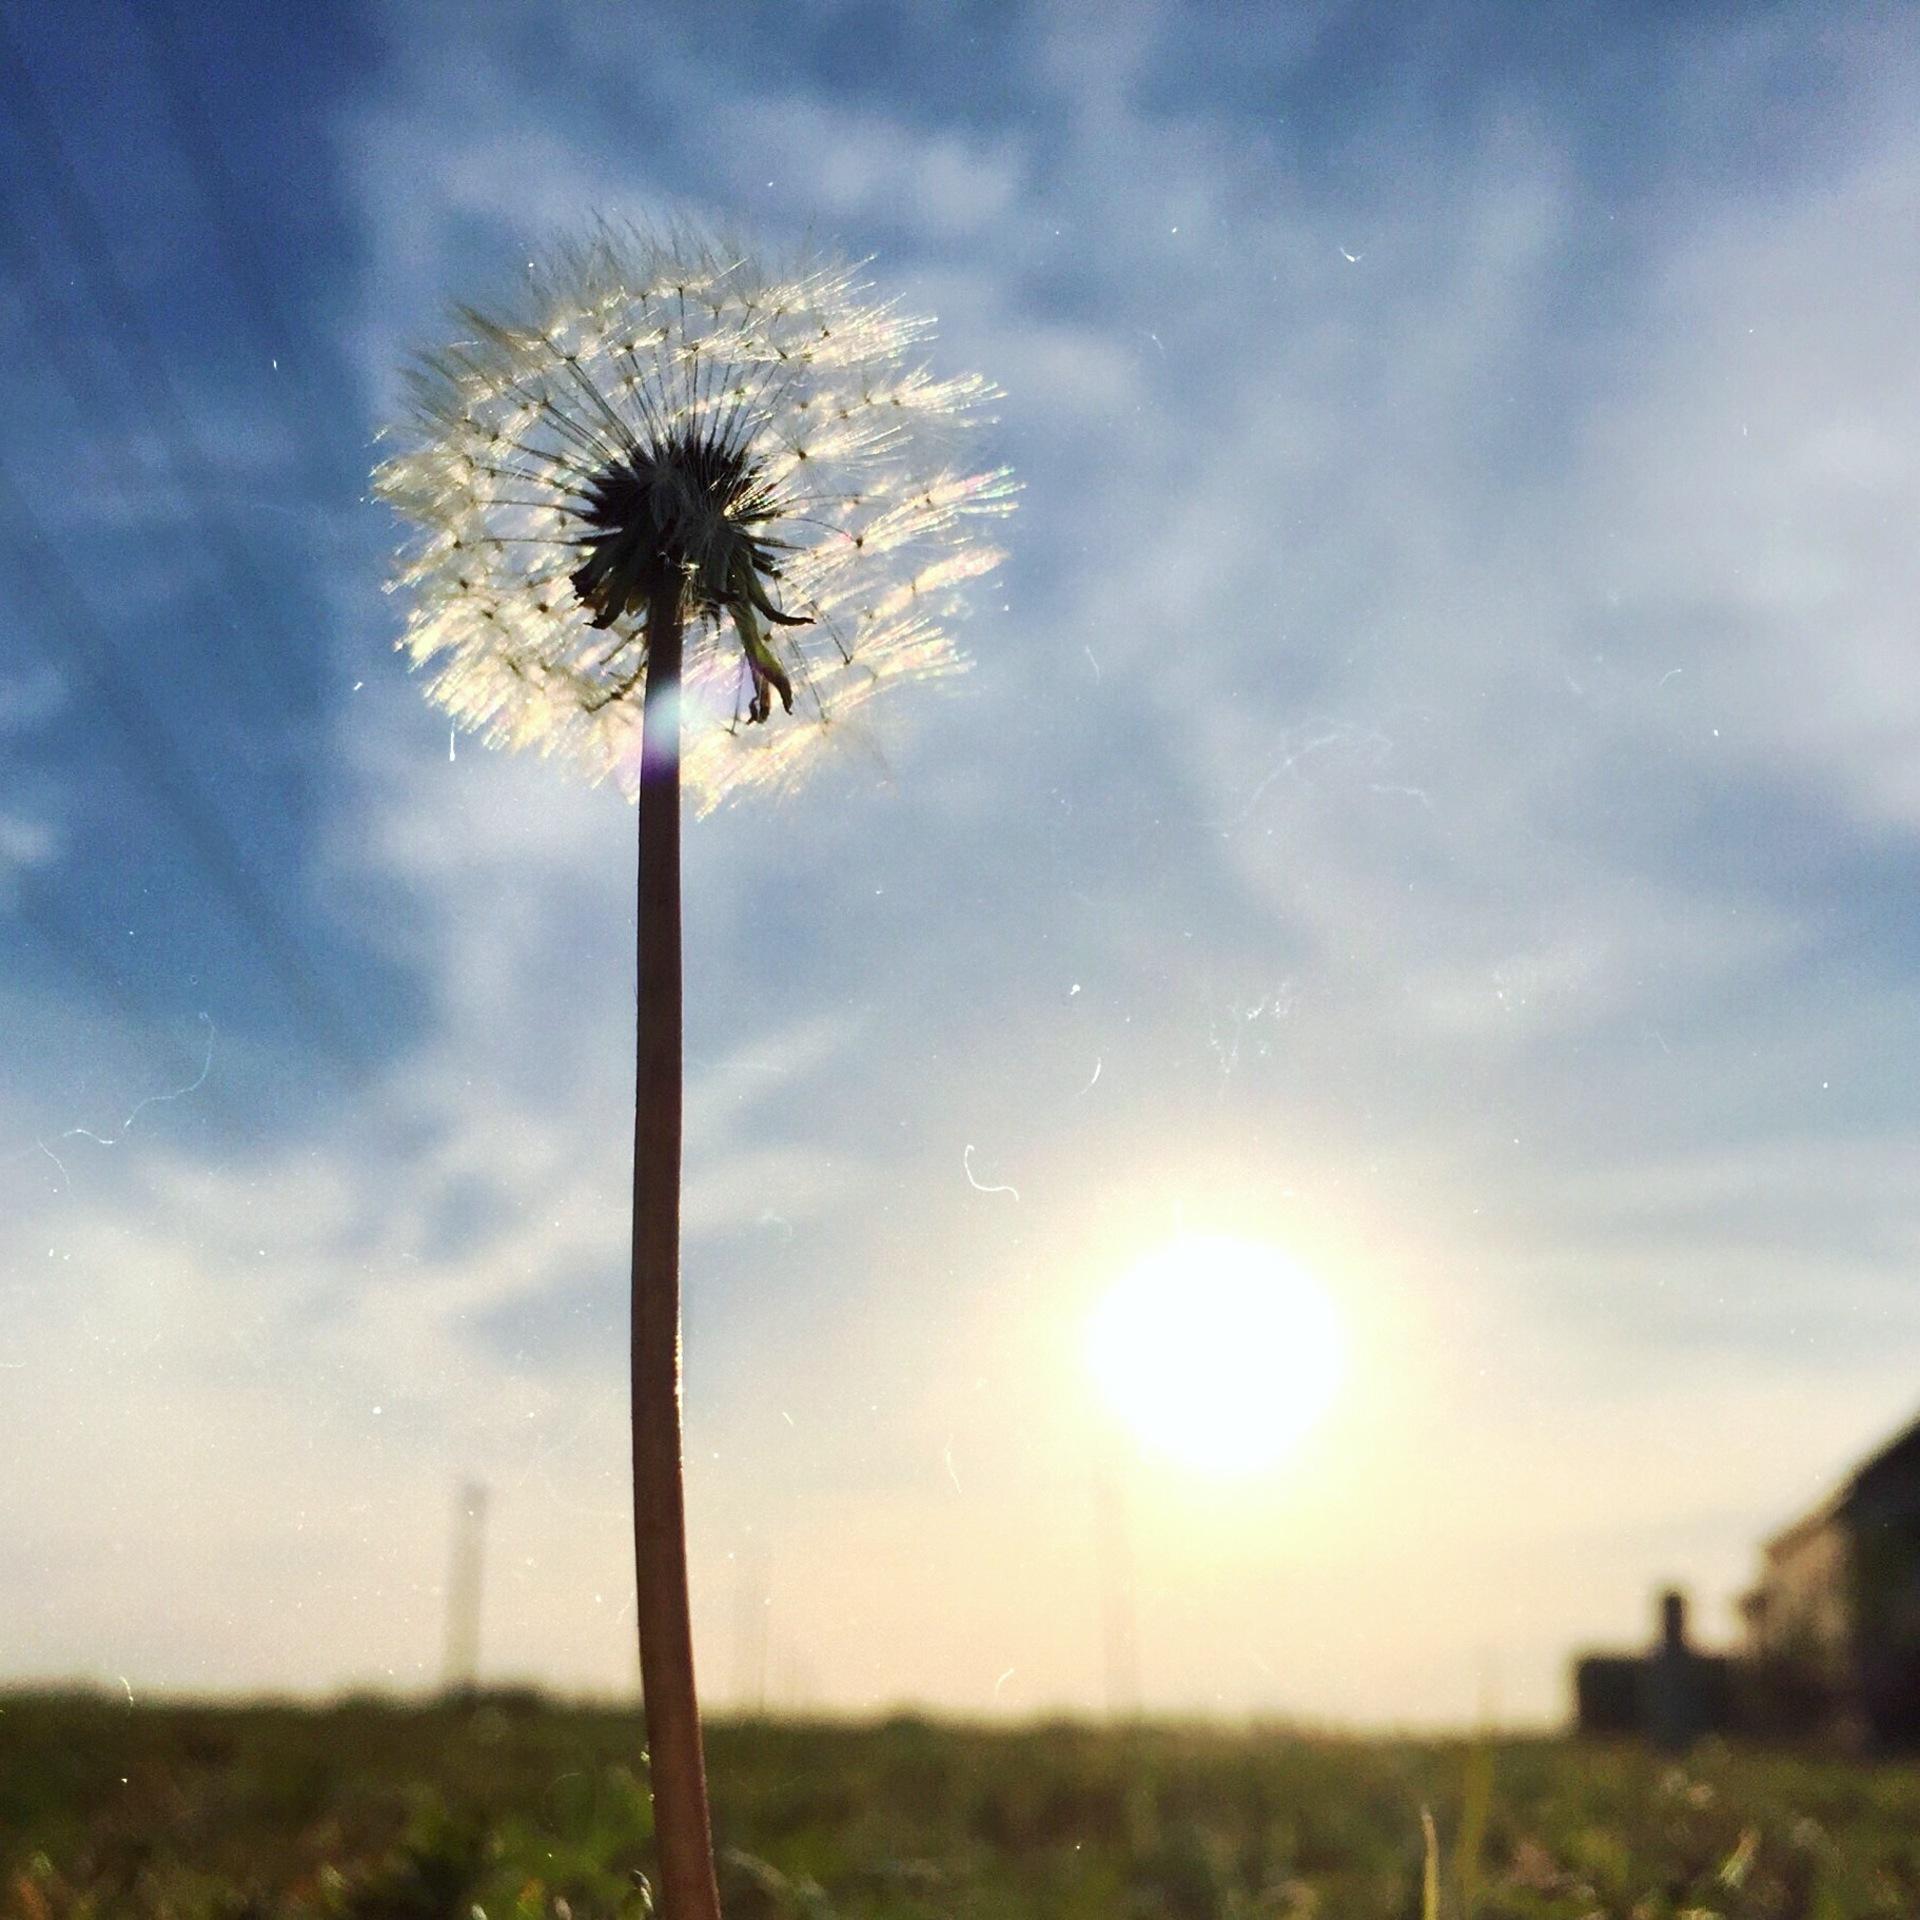 Dandelion Puff | raimy, blue sky, environment, grass